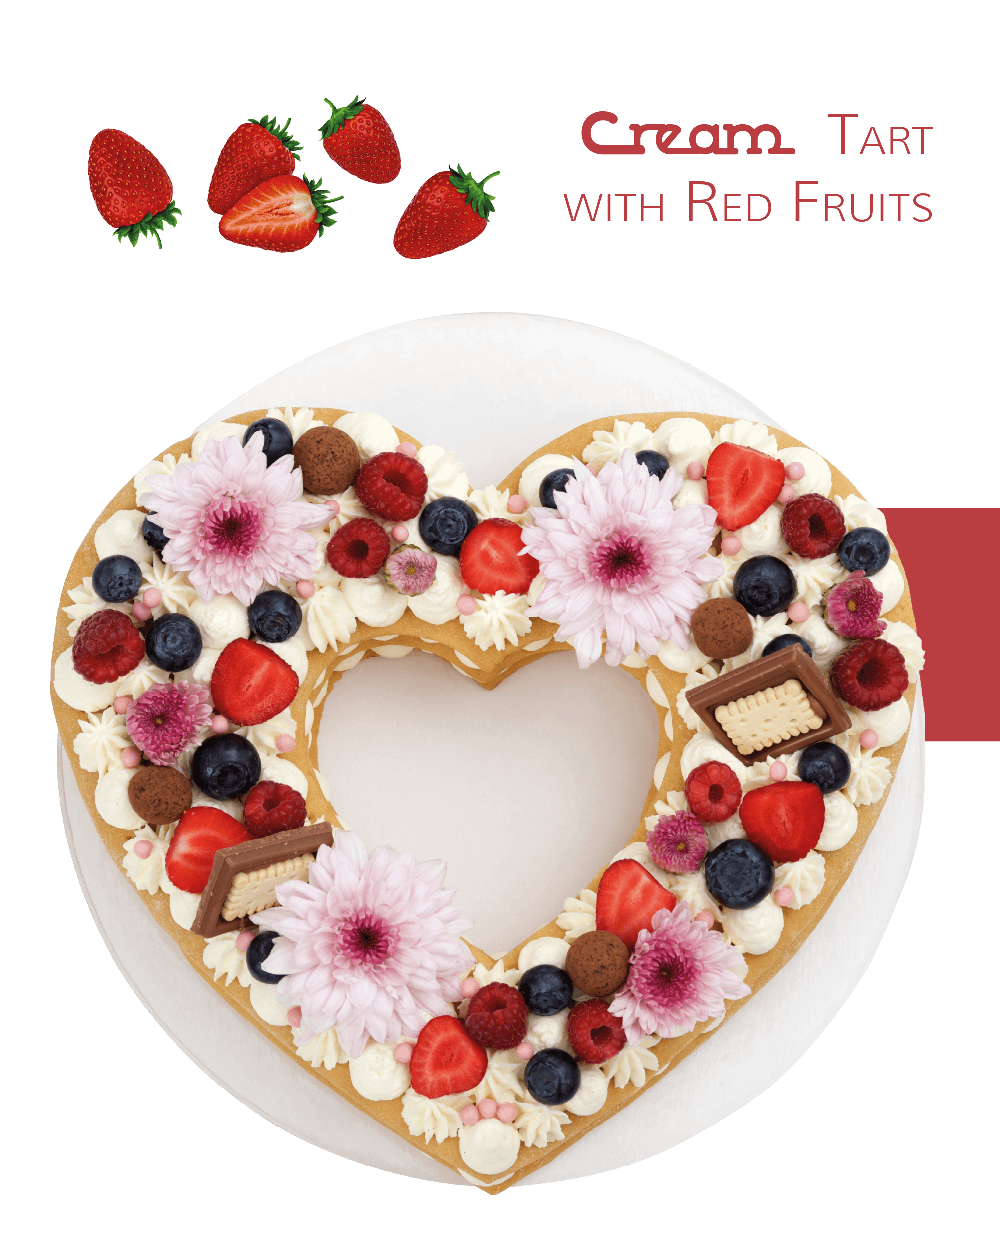 CAKE-DESIGN-CREAM-TART-WITH-RED-FRUITS-responsive